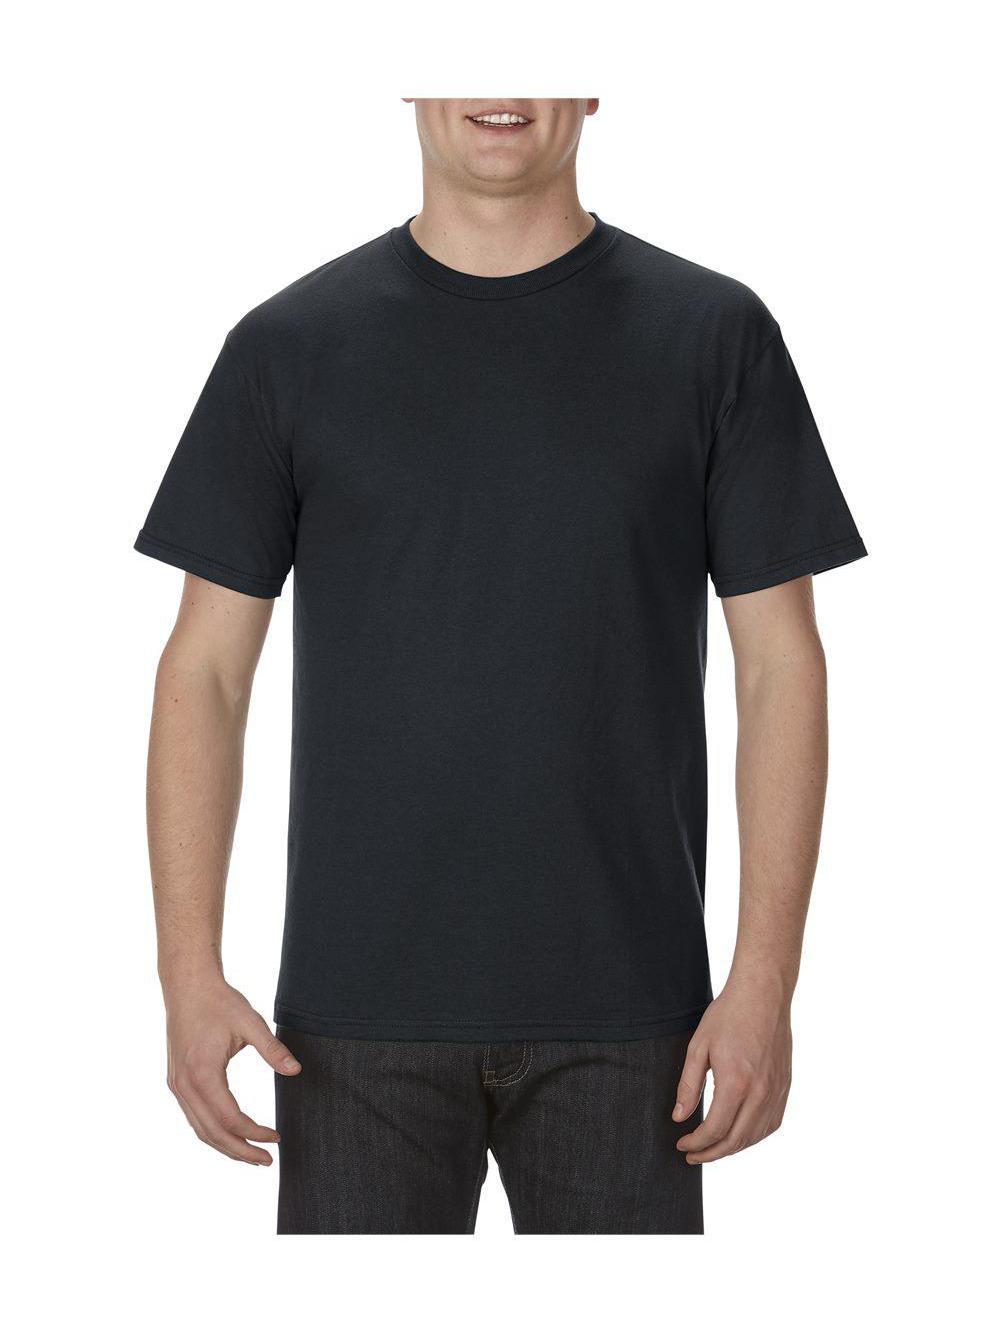 ALSTYLE-Premium-T-Shirt-1701 thumbnail 9